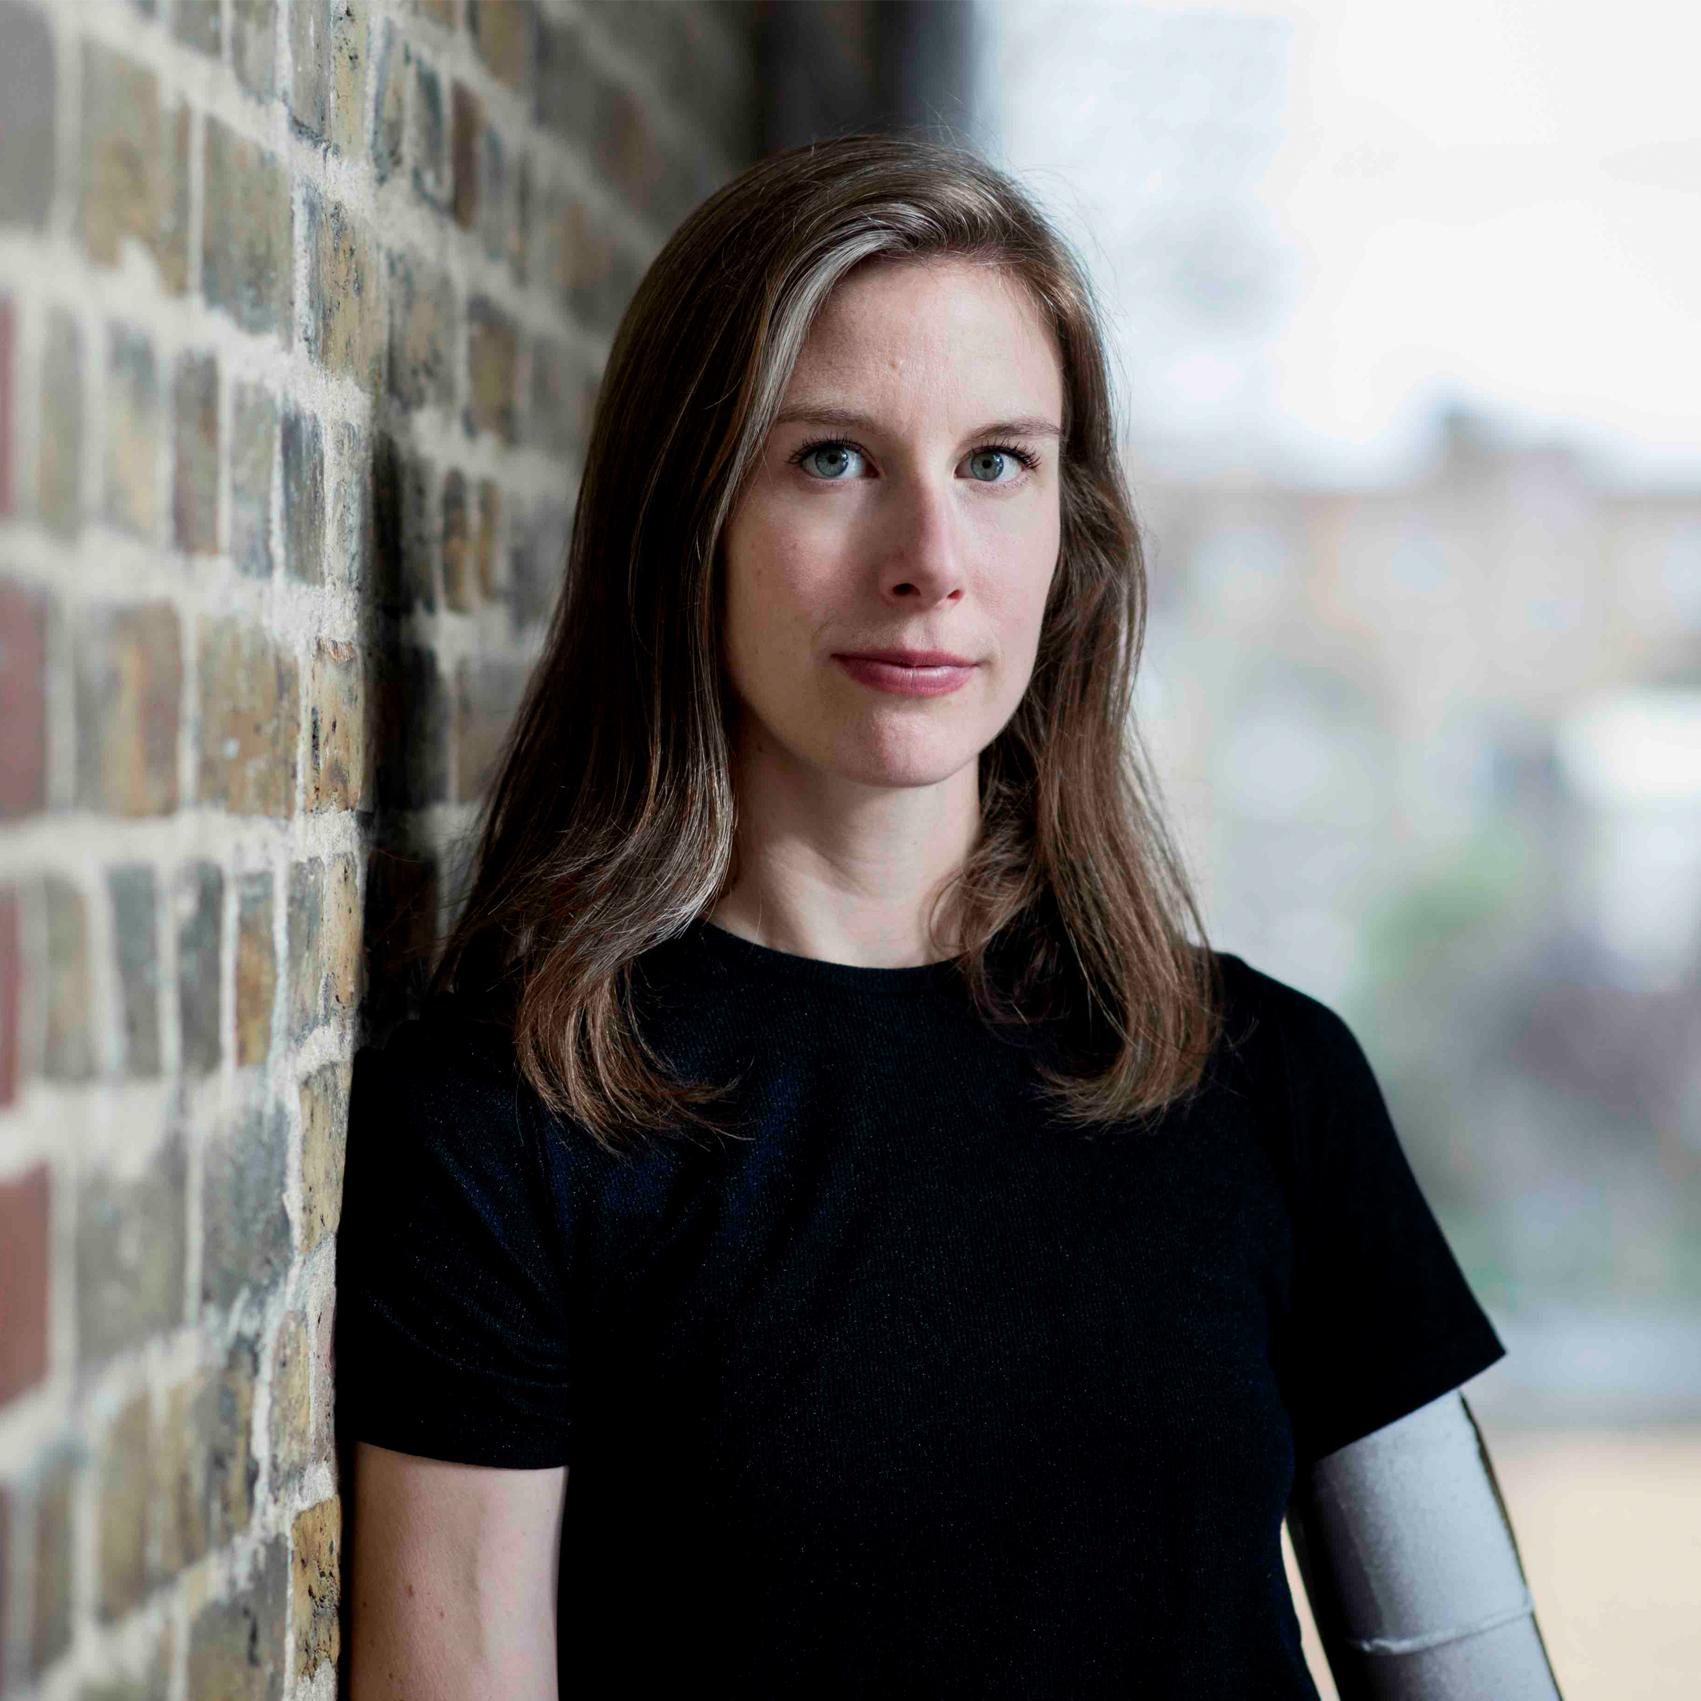 Annie Hanauer colour head and shoulders photo leaning against a brick wall